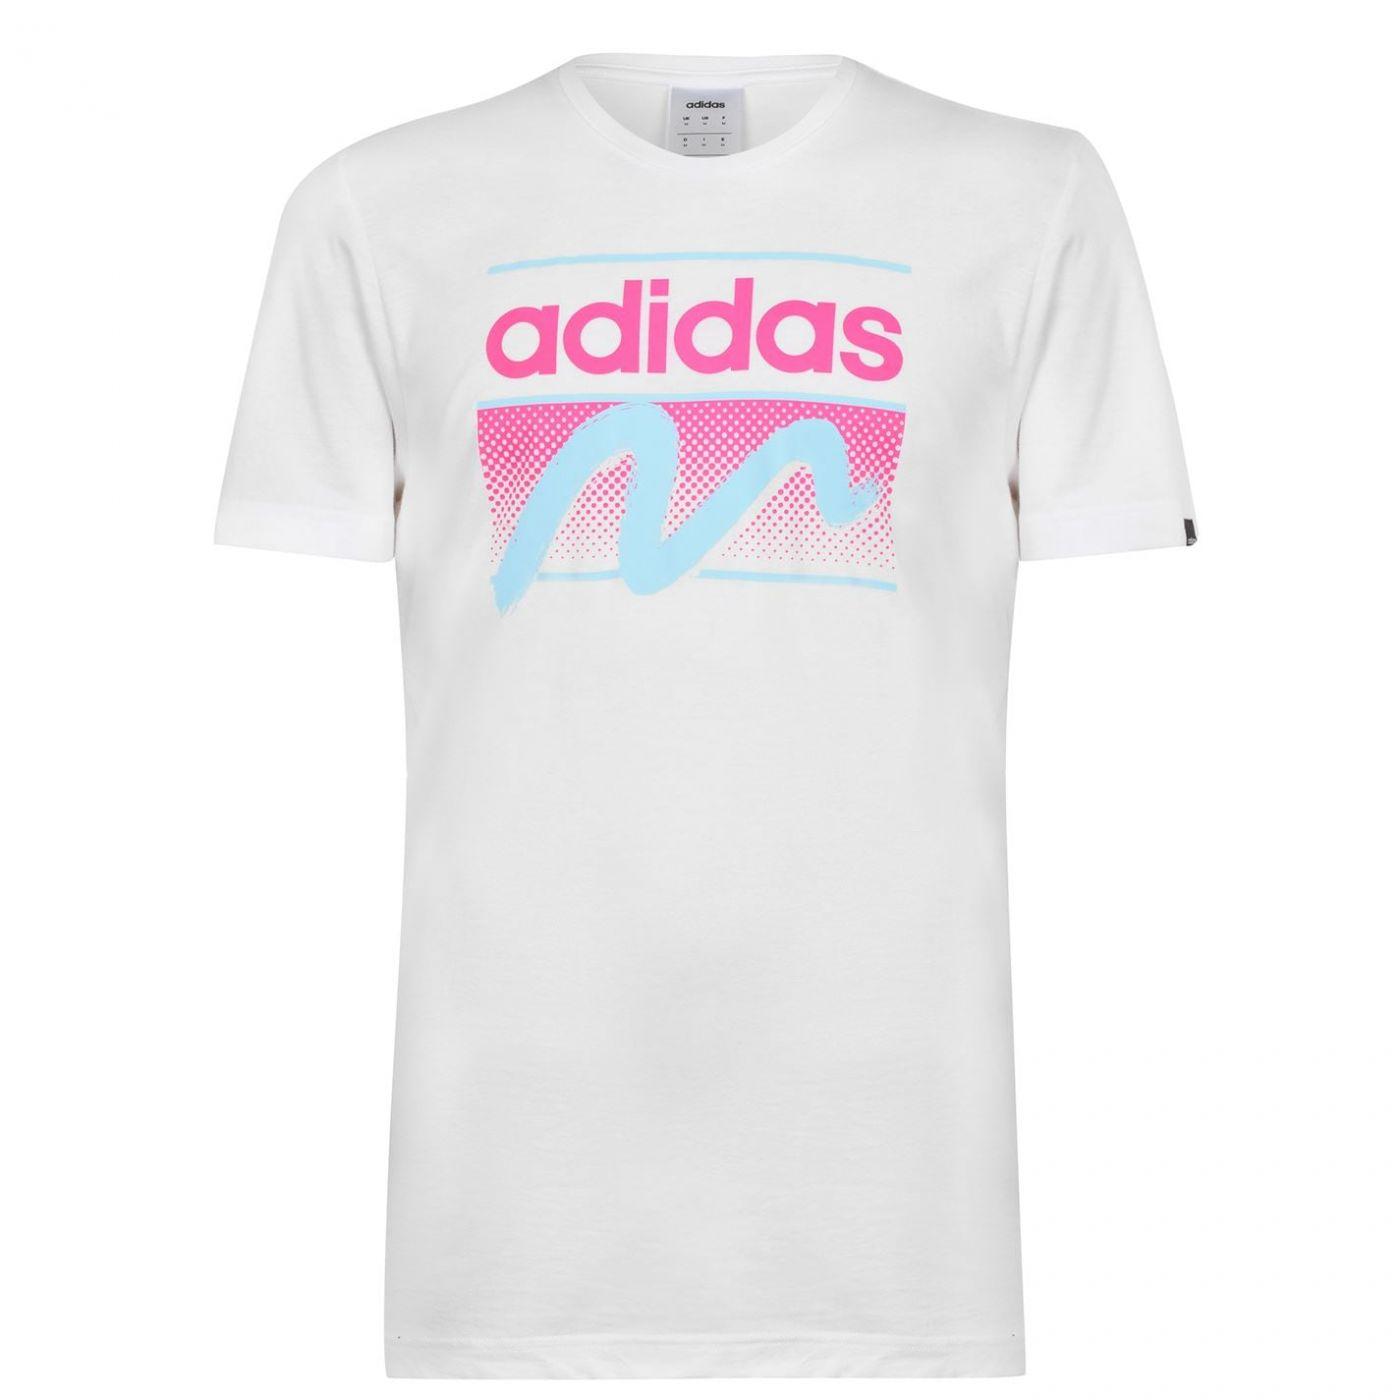 Adidas Wavy Linear QT 03